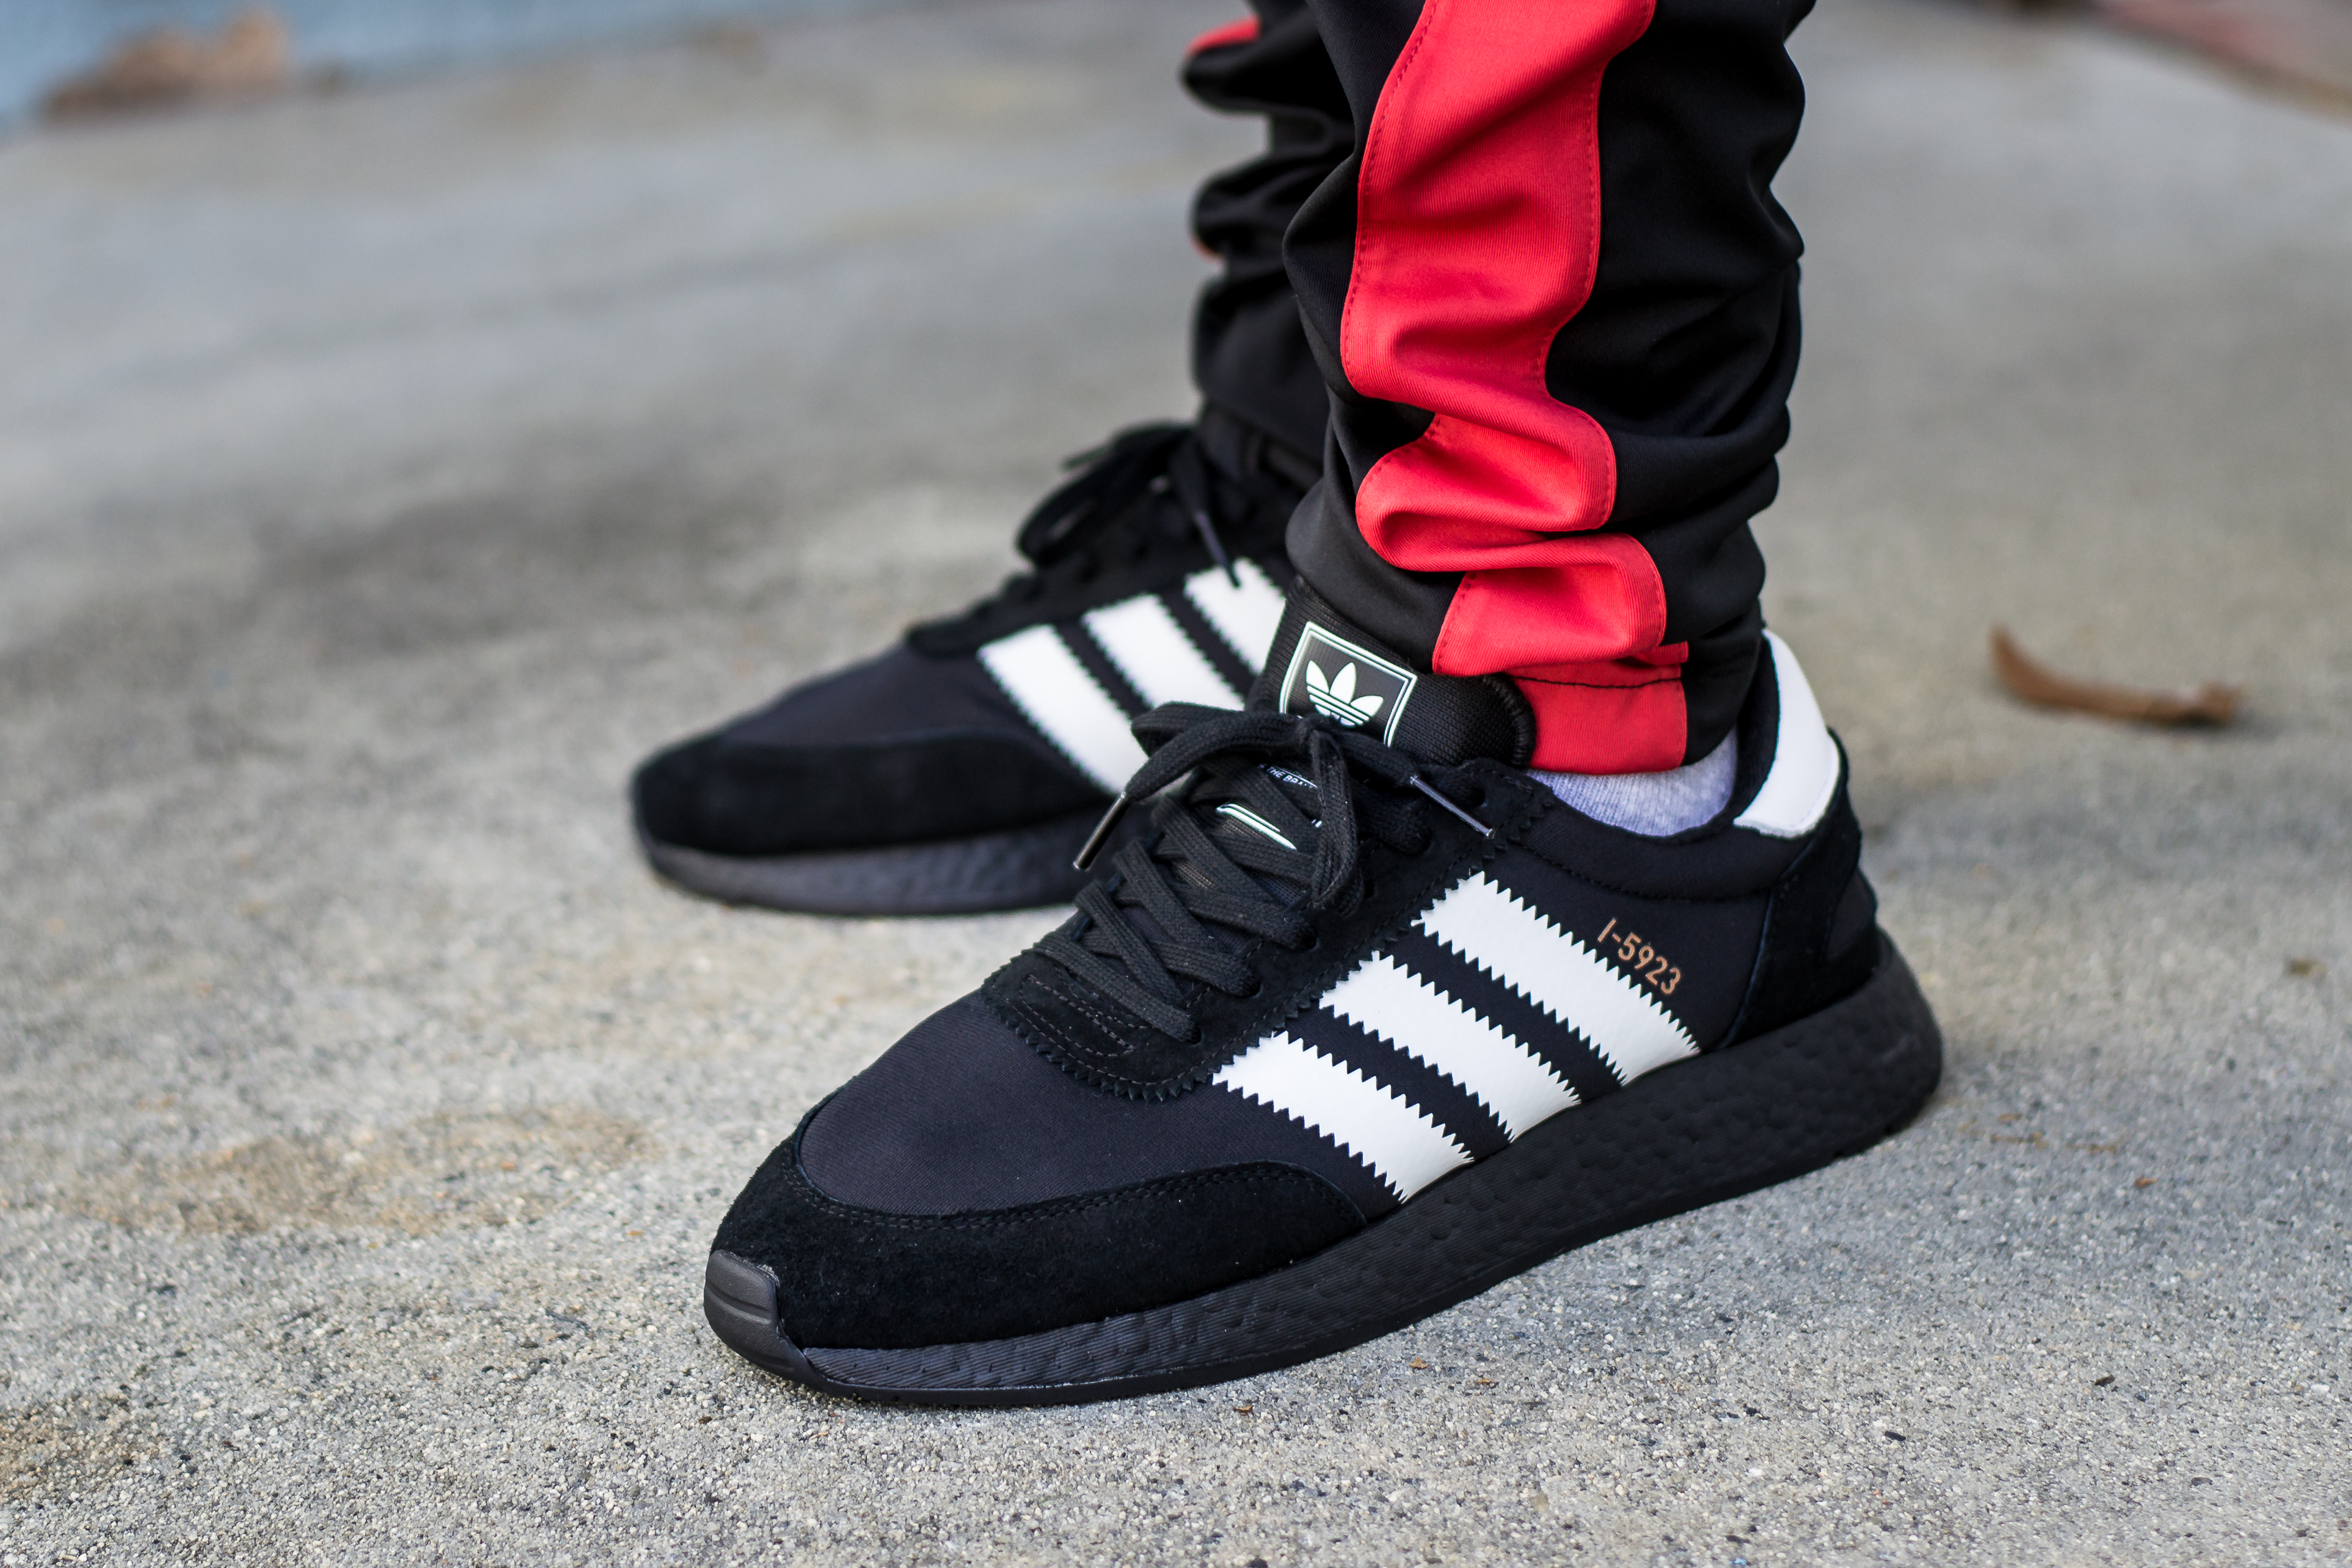 Adidas I-5923 Iniki Black Boost On Feet Sneaker Review d4dd7e90e